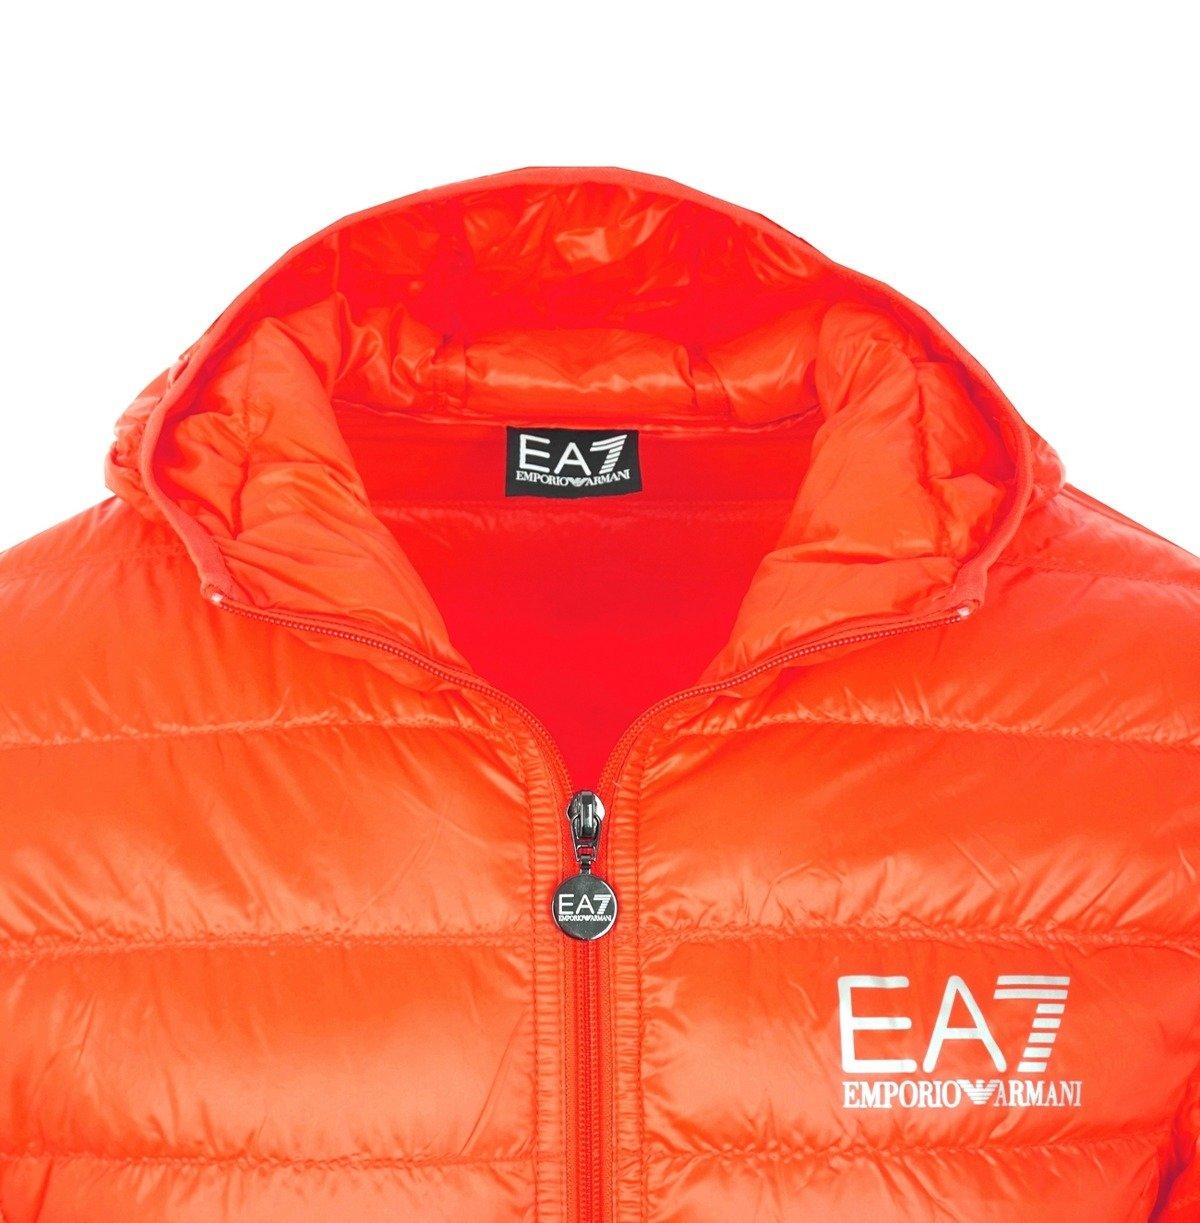 c46ea551282c1d ... EMPORIO ARMANI EA7 Herren Men Daunen Down Steppjacke Jacket Kapuze  Orange Click to zoom ...